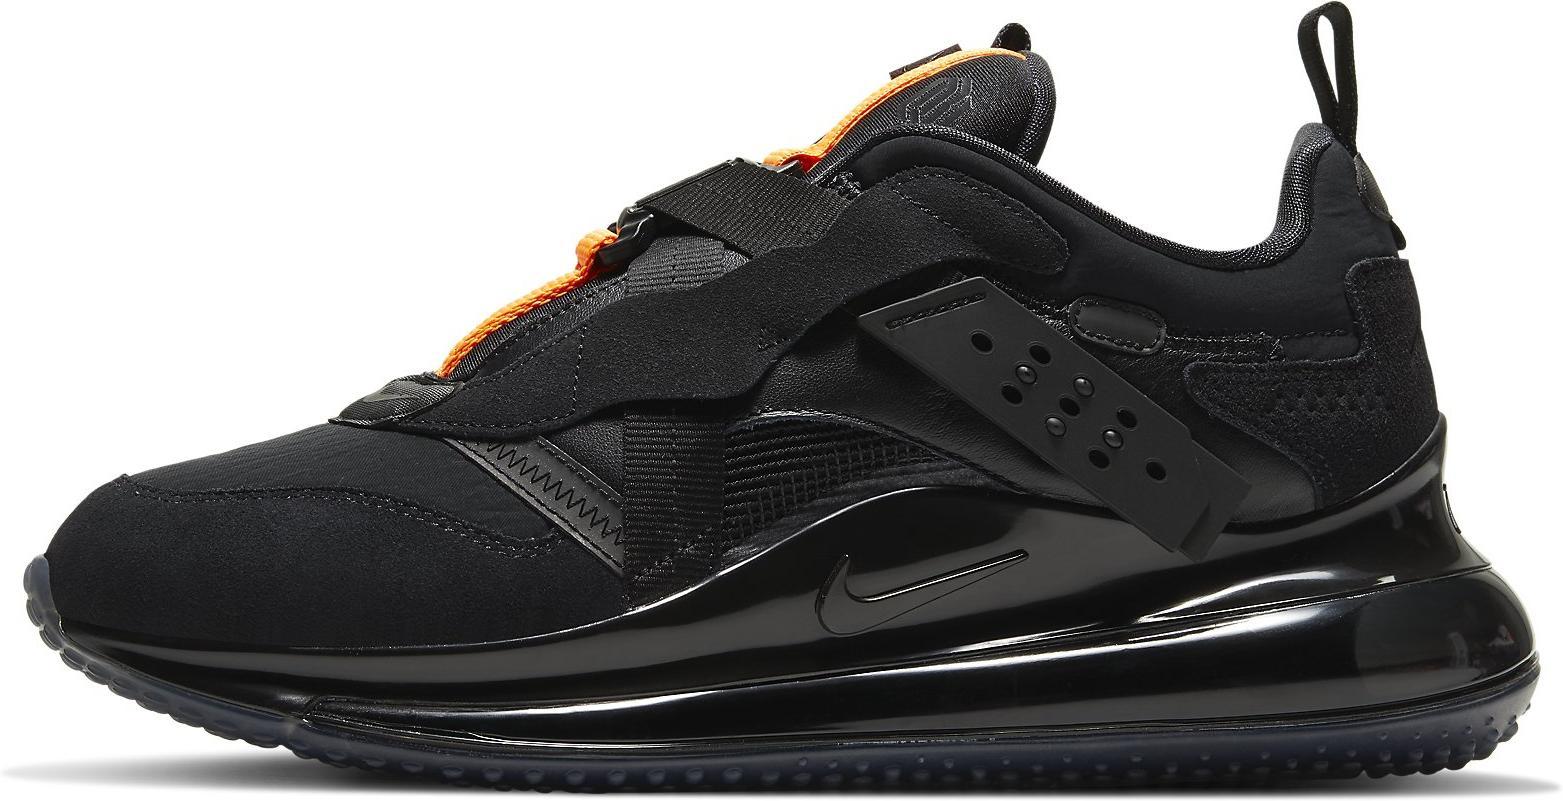 Zapatillas Nike AIR MAX 720 OBJ SLIP